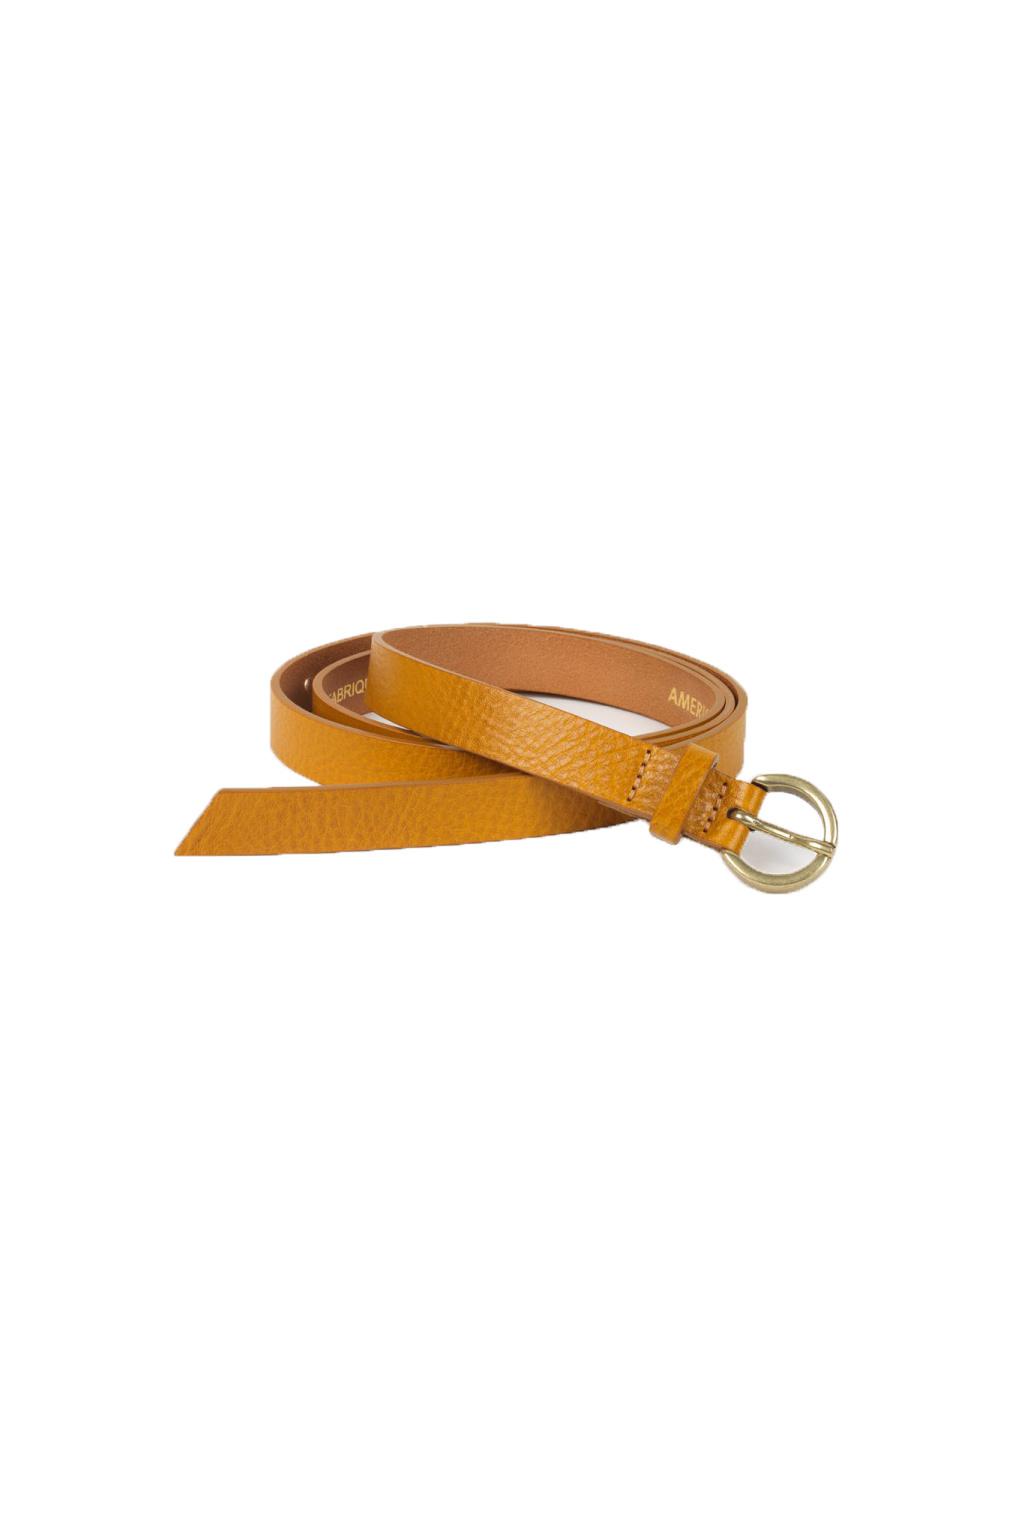 Lomabay Belt - Marmelade Yellow-1